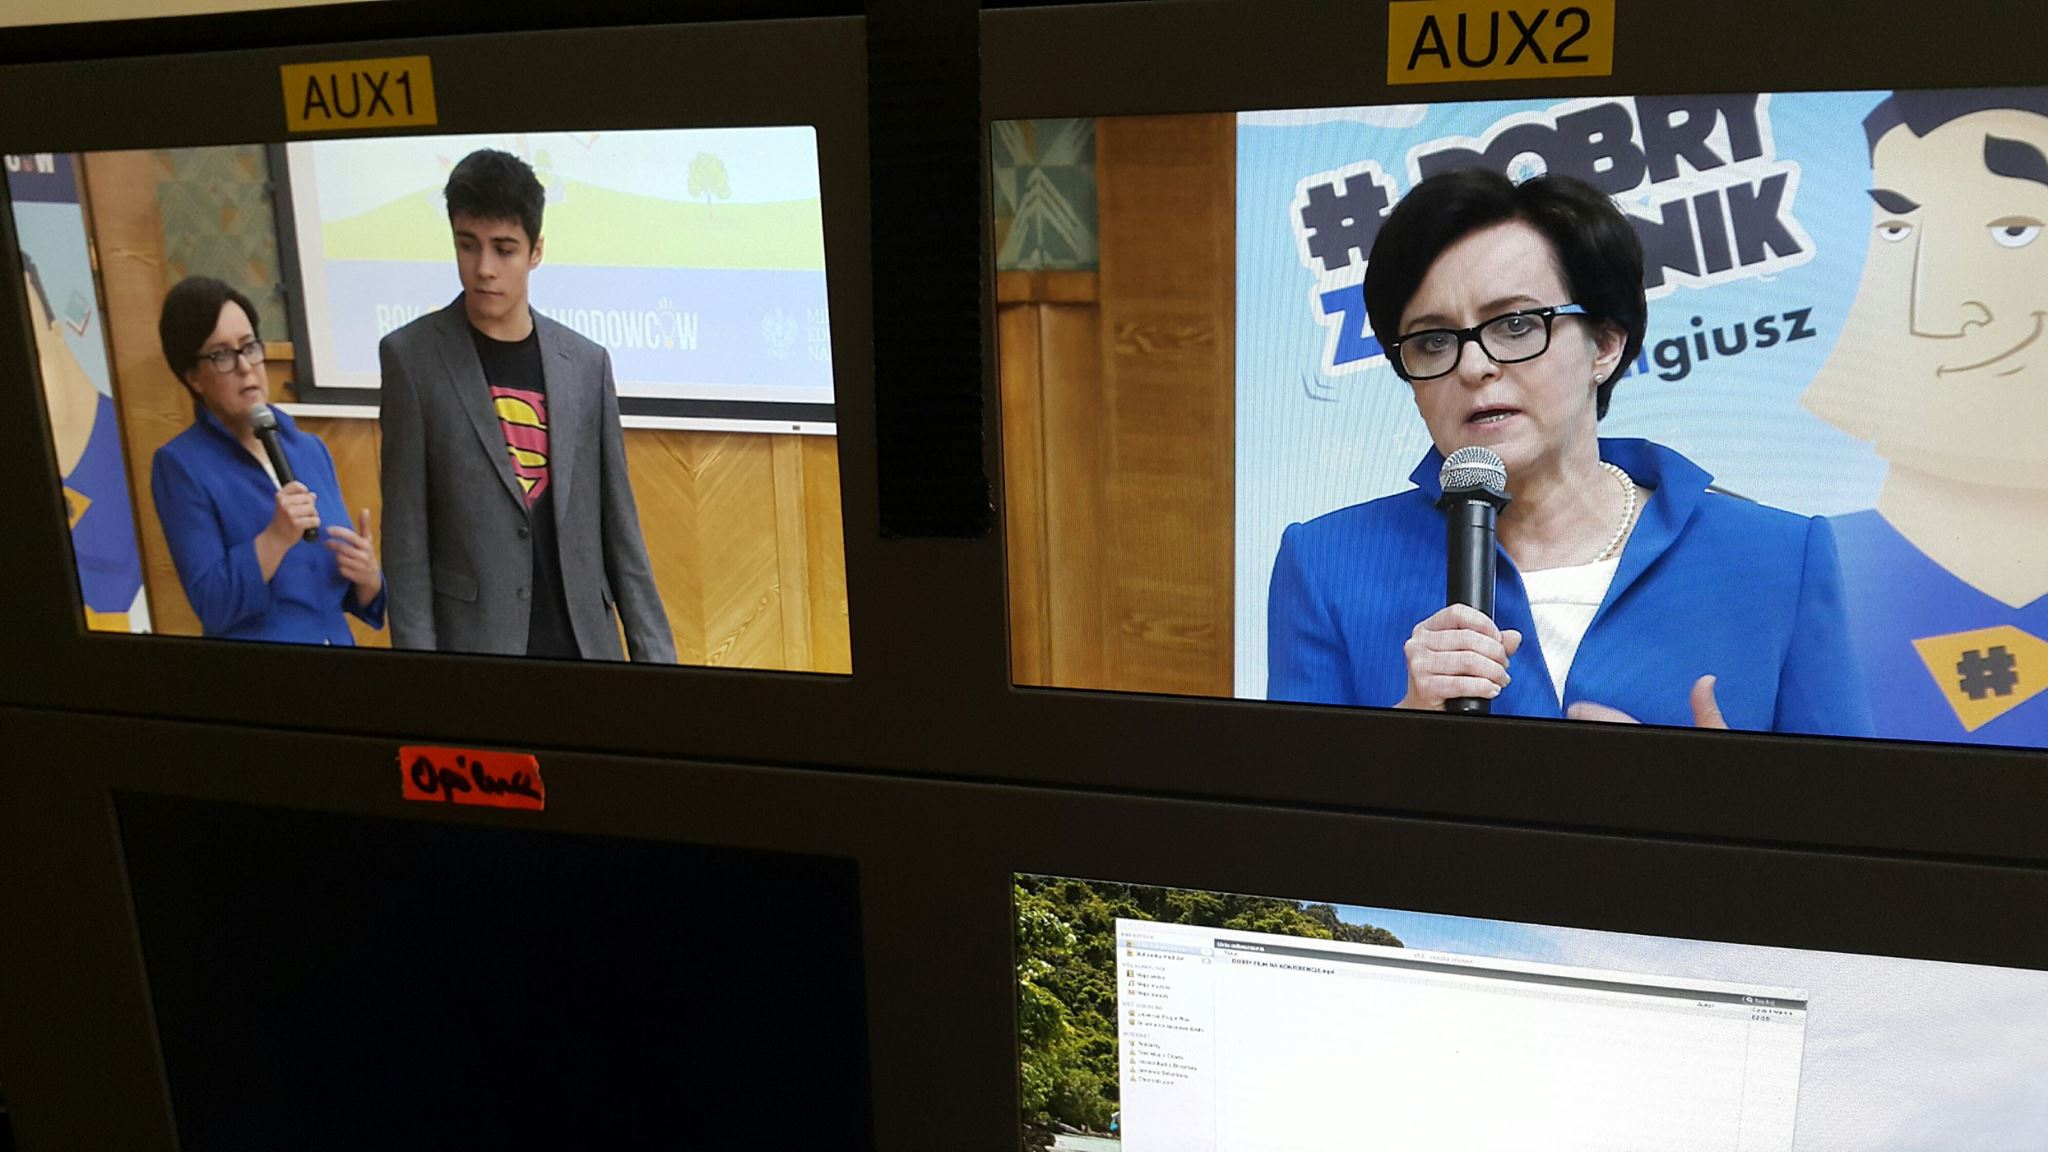 streaming-konferencje-prasowe-ekrany